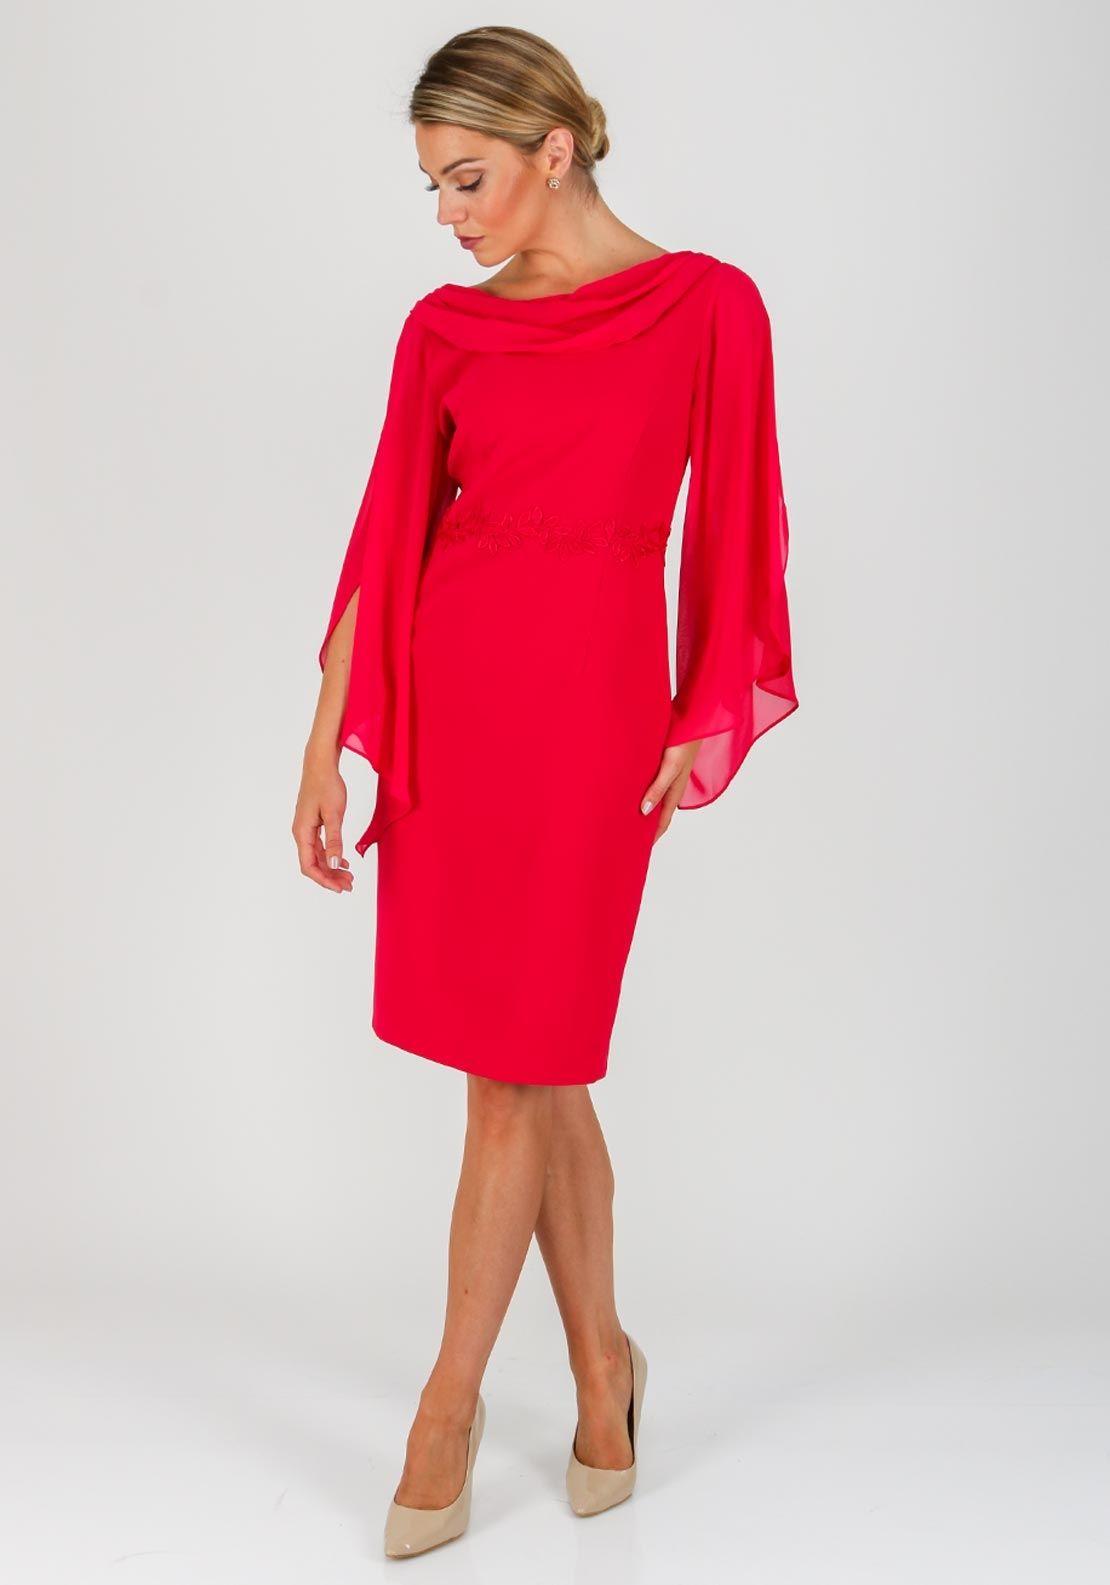 0d30097bdc24 Lizabella Chiffon Sleeve Shawl Collar Dress